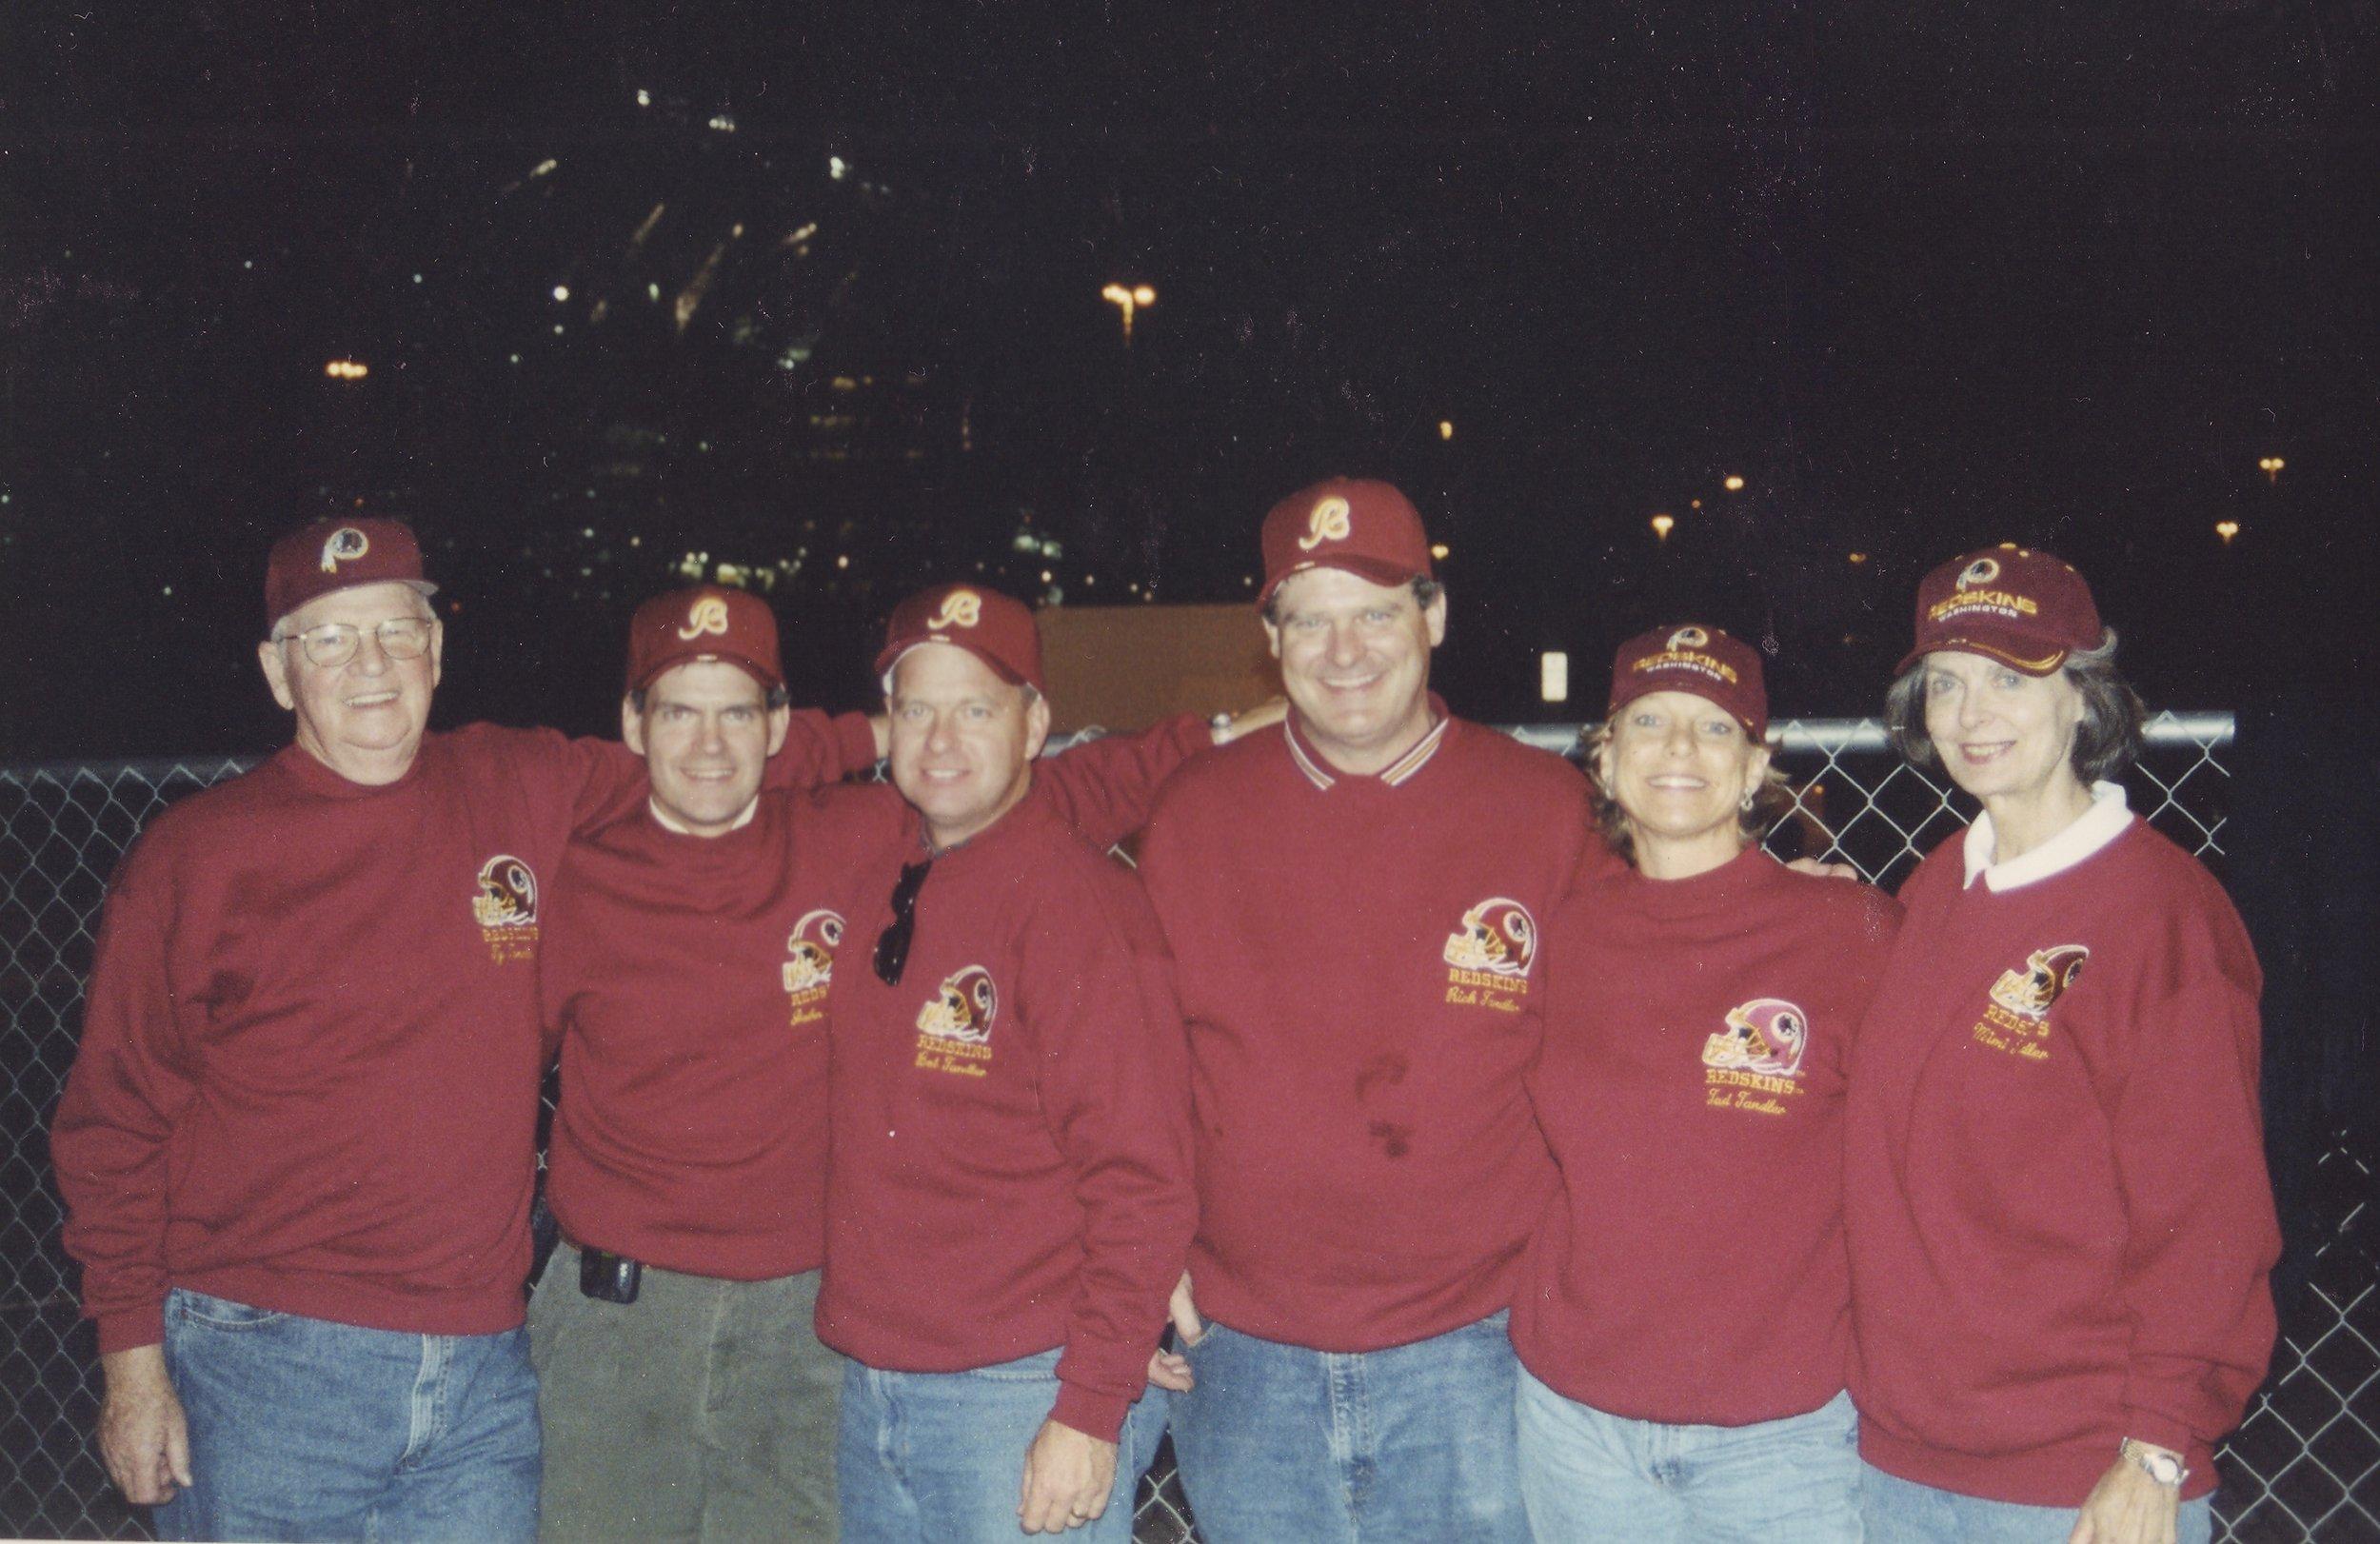 Redskins fans, Ty, John, Bob, Rich, Tad, and Mimi.